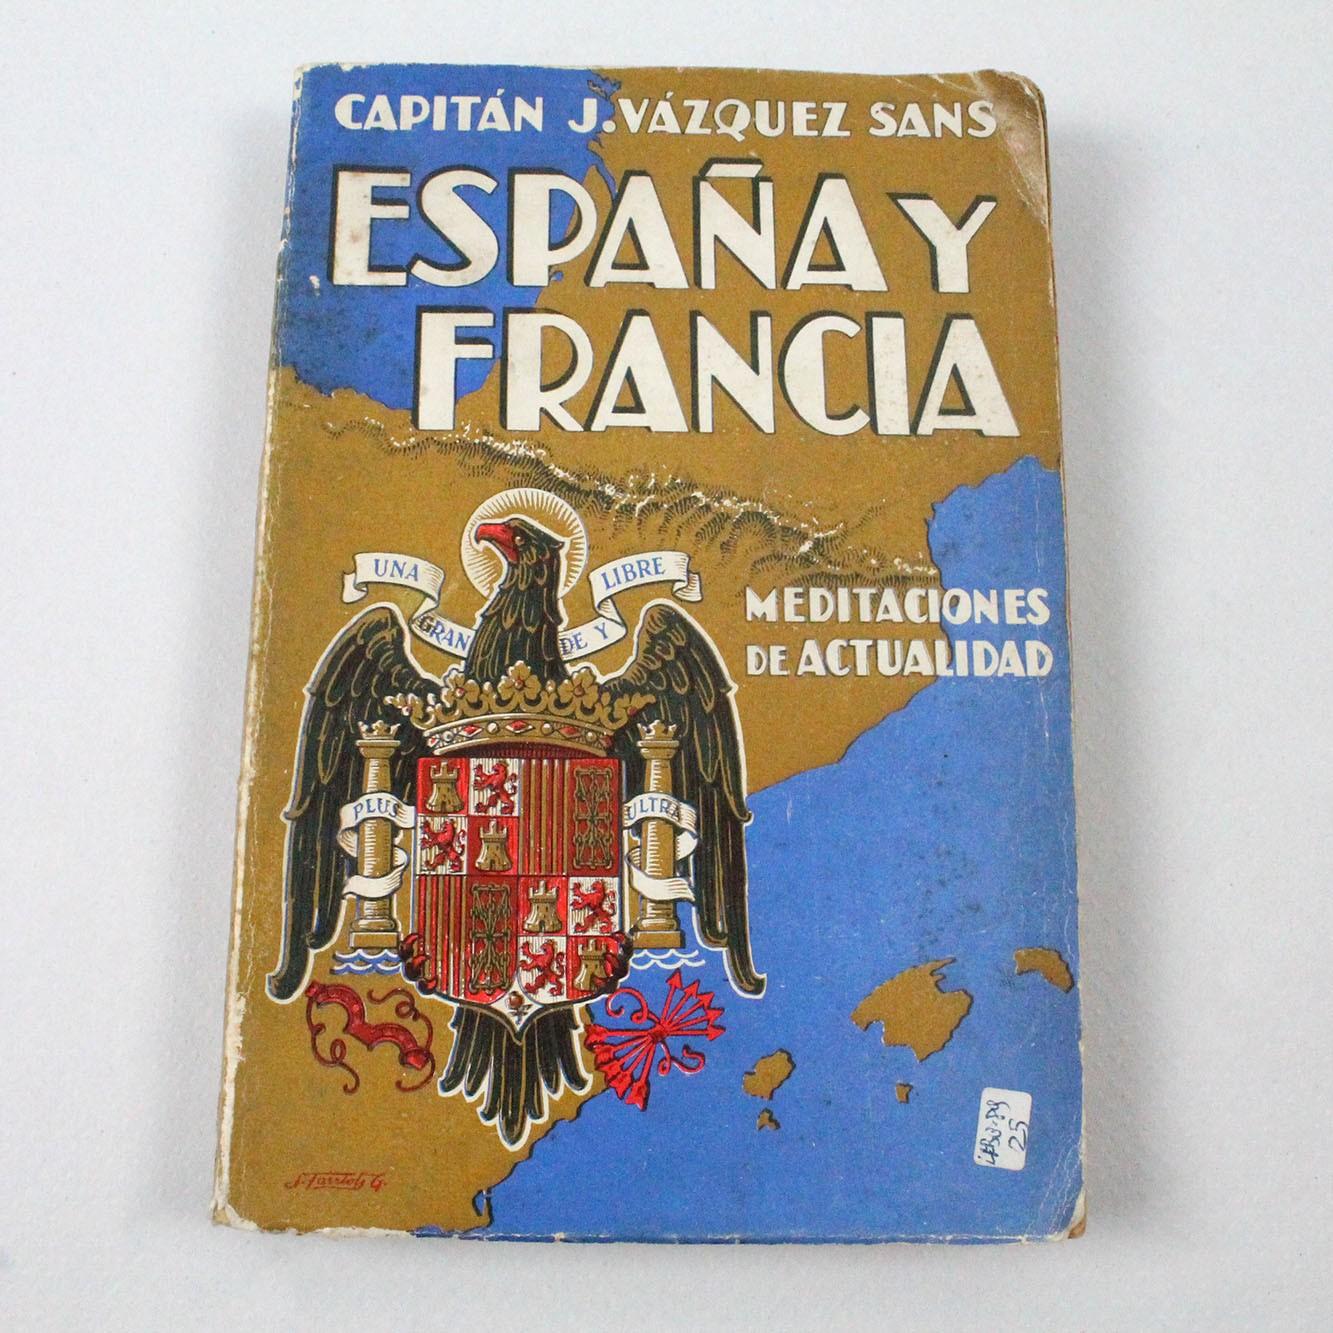 LIBE-ESPAÑA Y FRANCIA